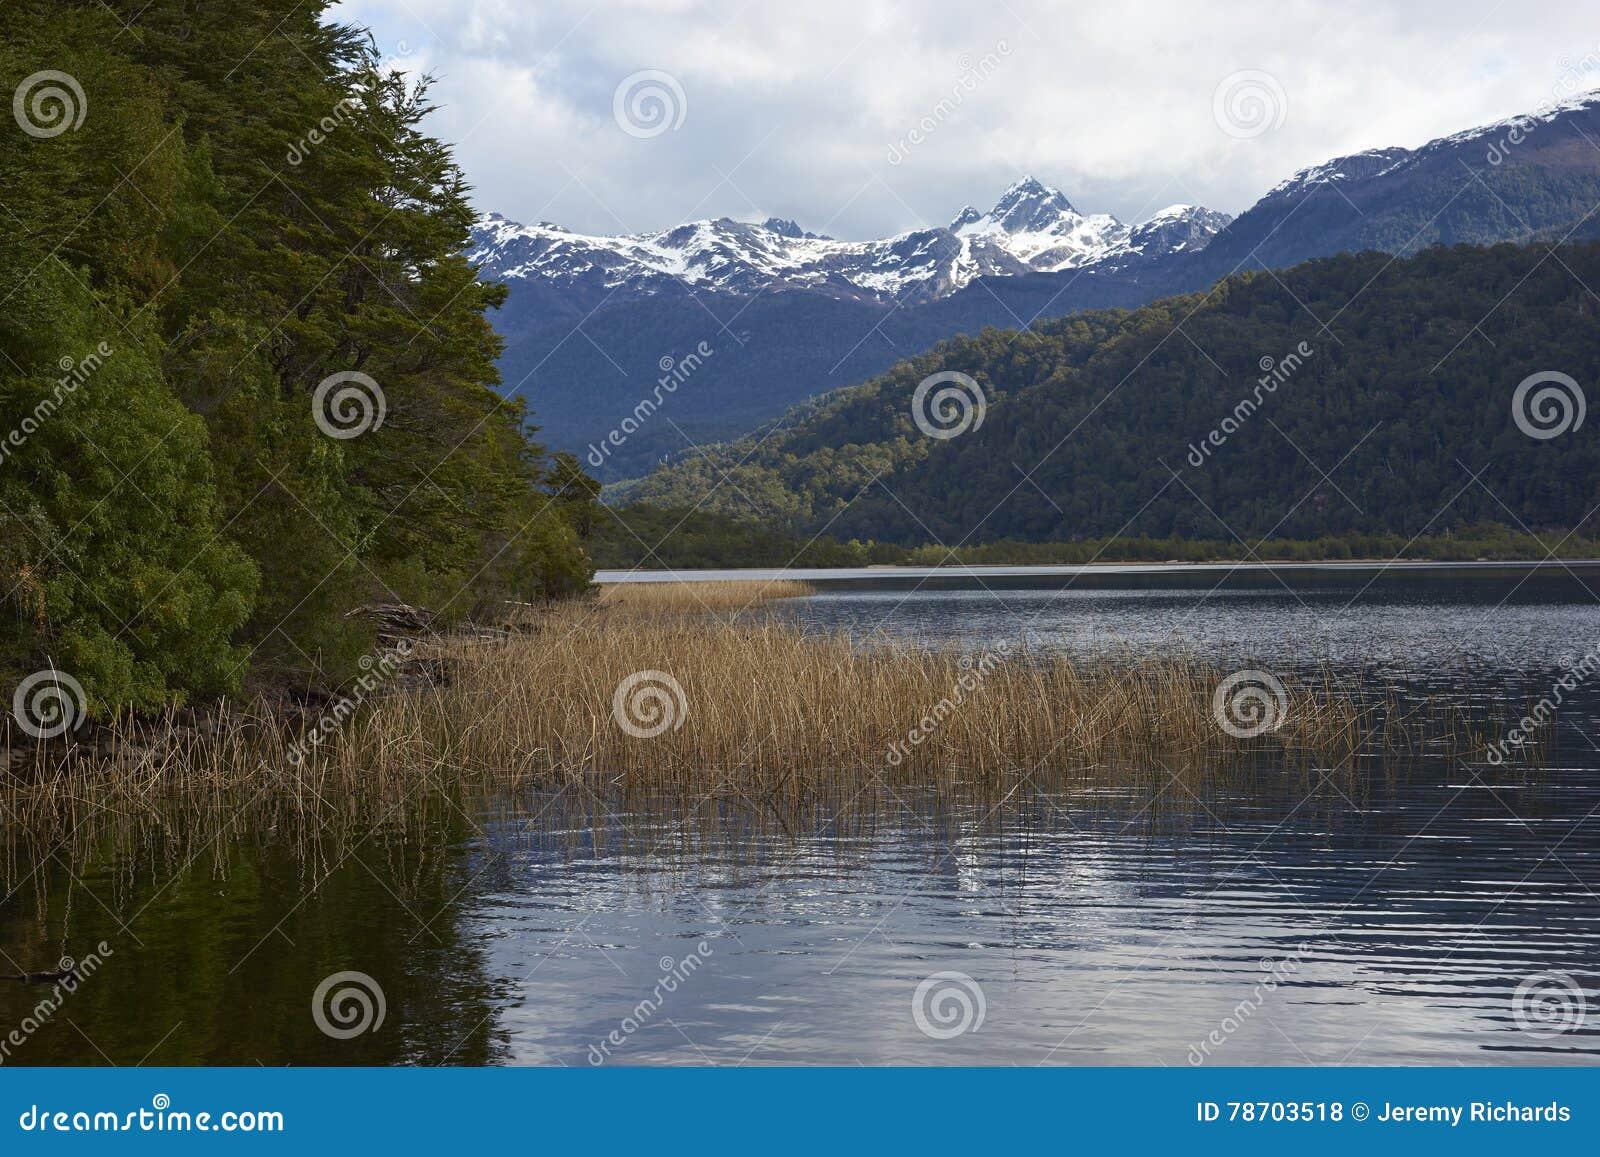 Scenic lake along the Carretera Austral